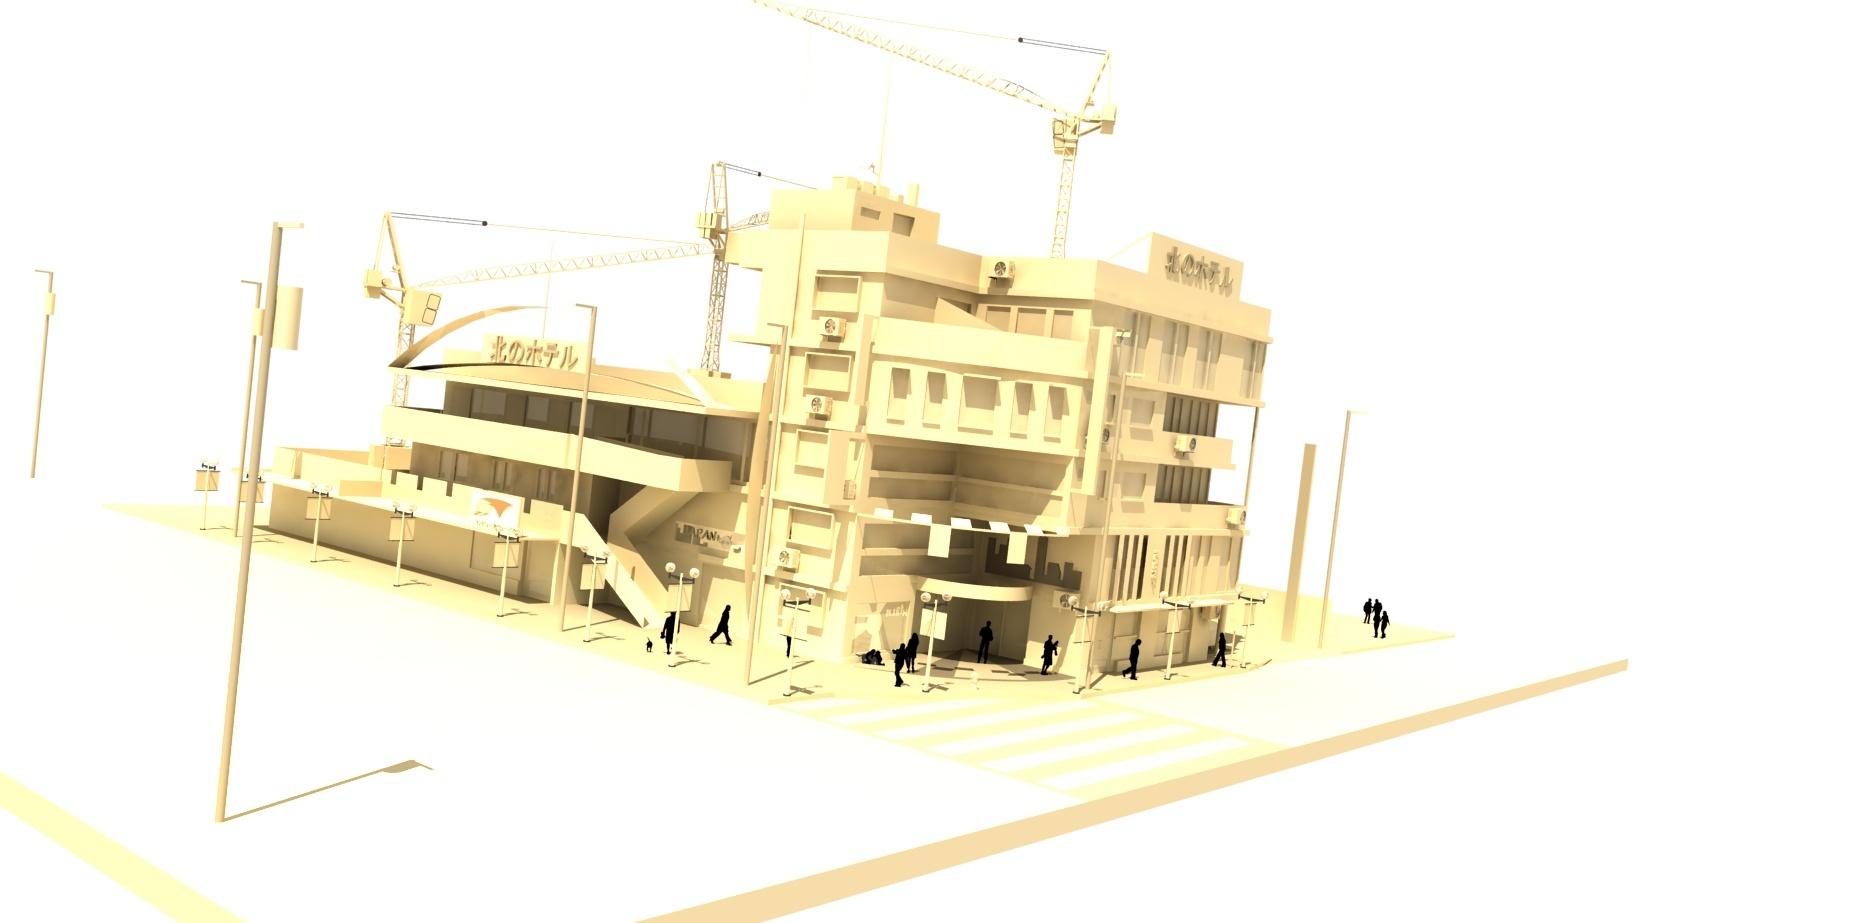 SketchUp'eur architecte -AnthO'- - Page 5 C10